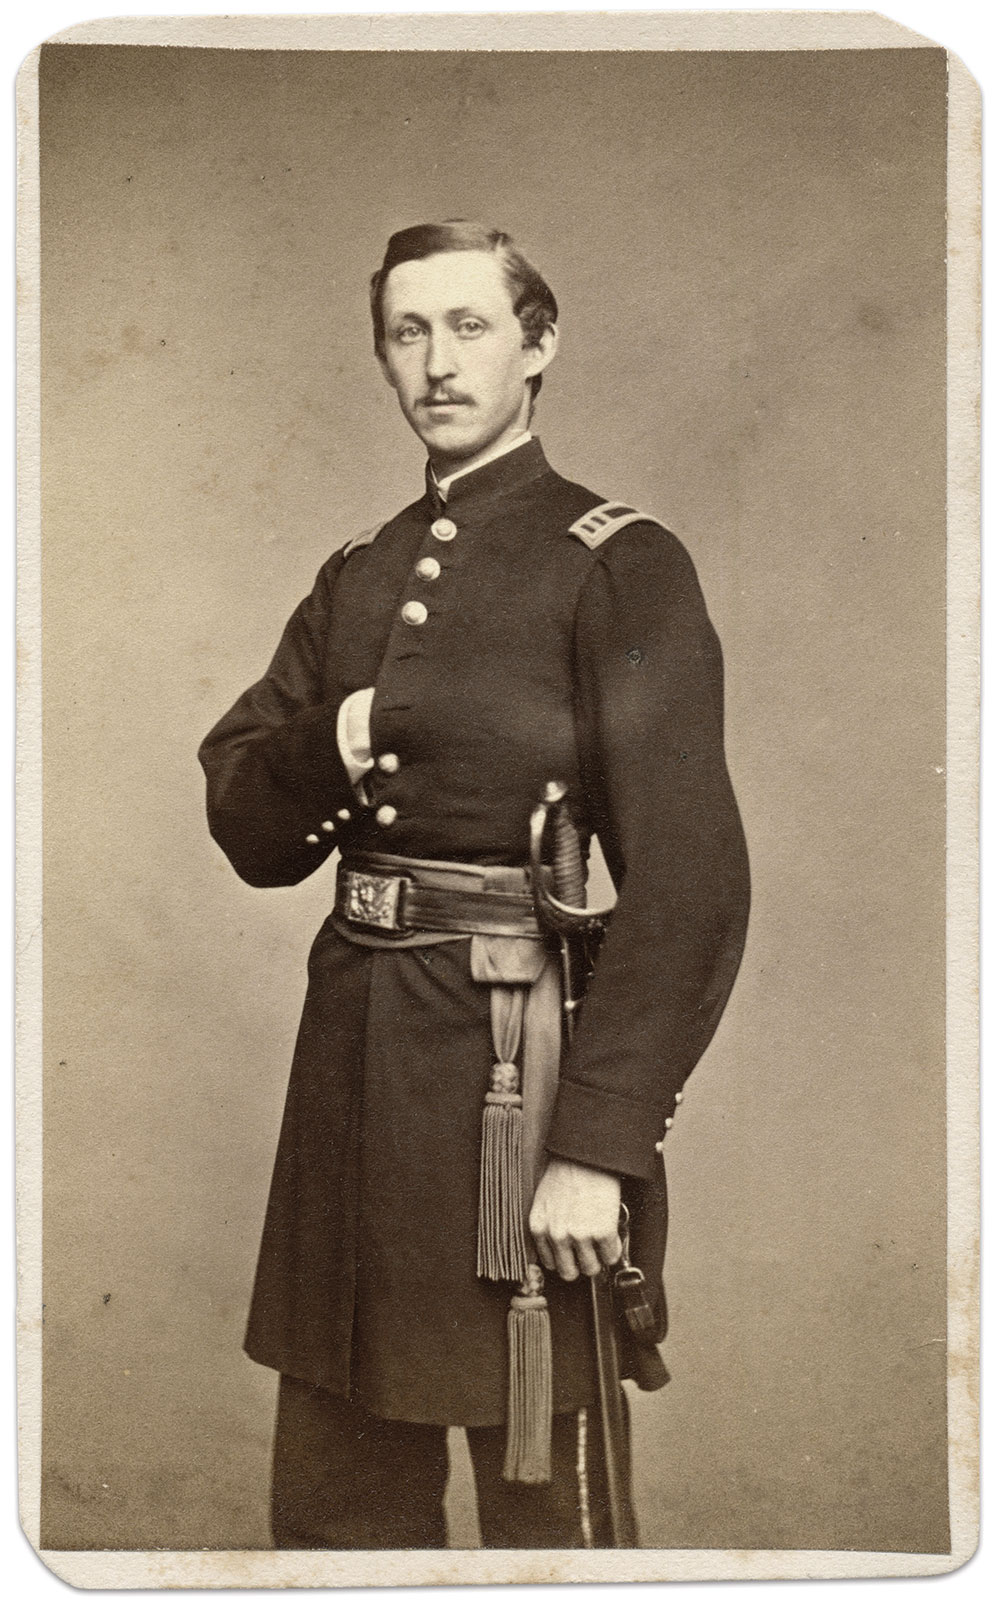 King, pictured as captain and quartermaster. Carte de visite by Henry Ulke of Washington, D.C. Ronald S. Coddington Collection.